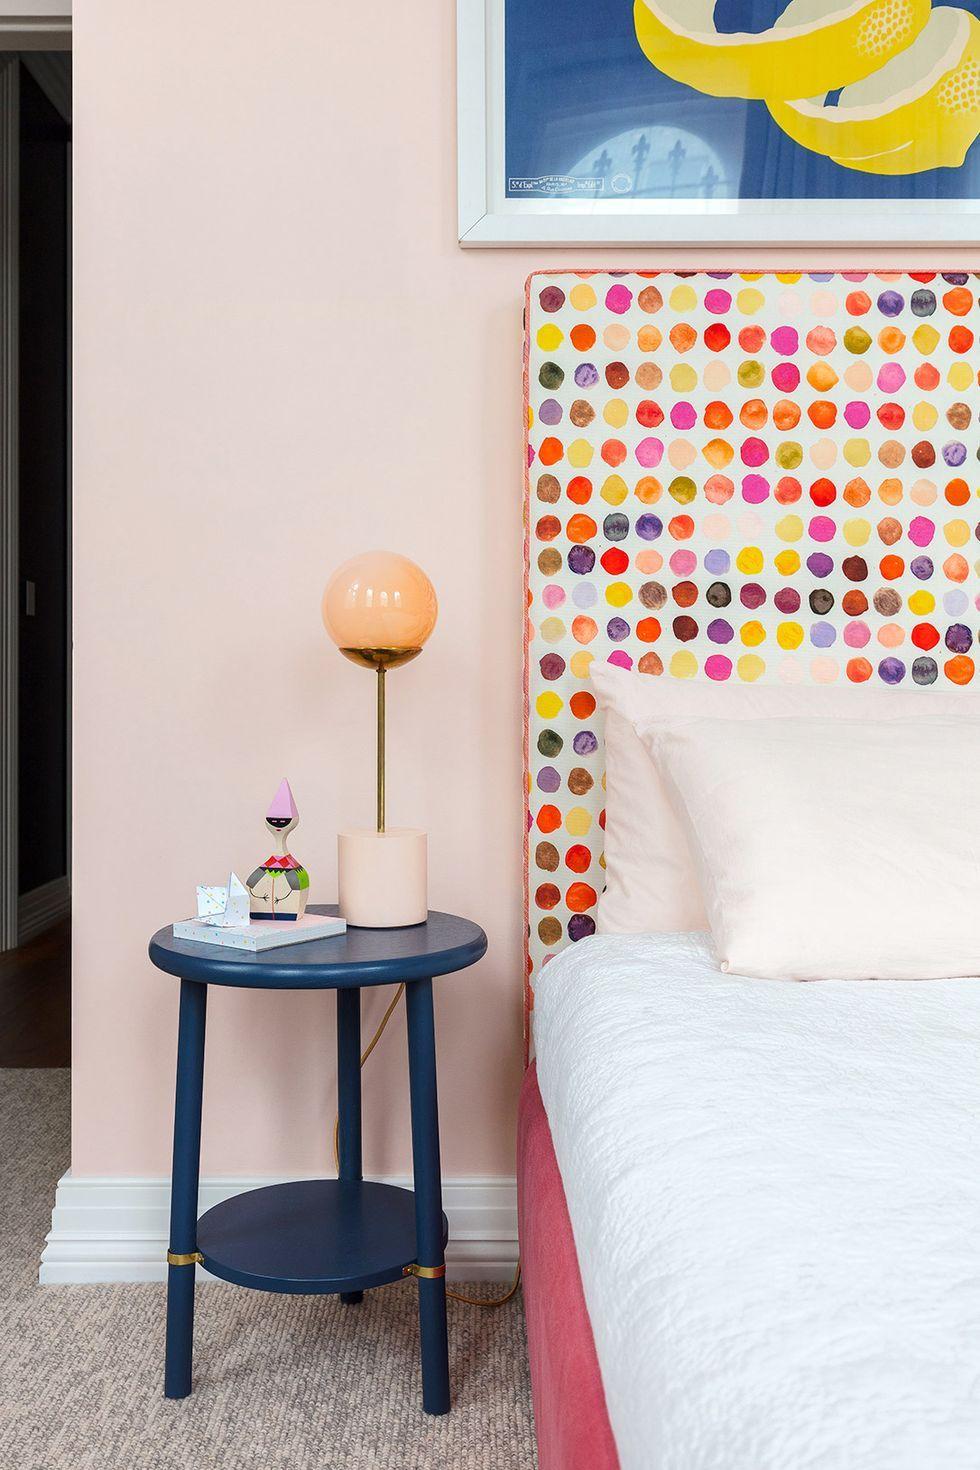 teen bedroom ideas - statement headboard